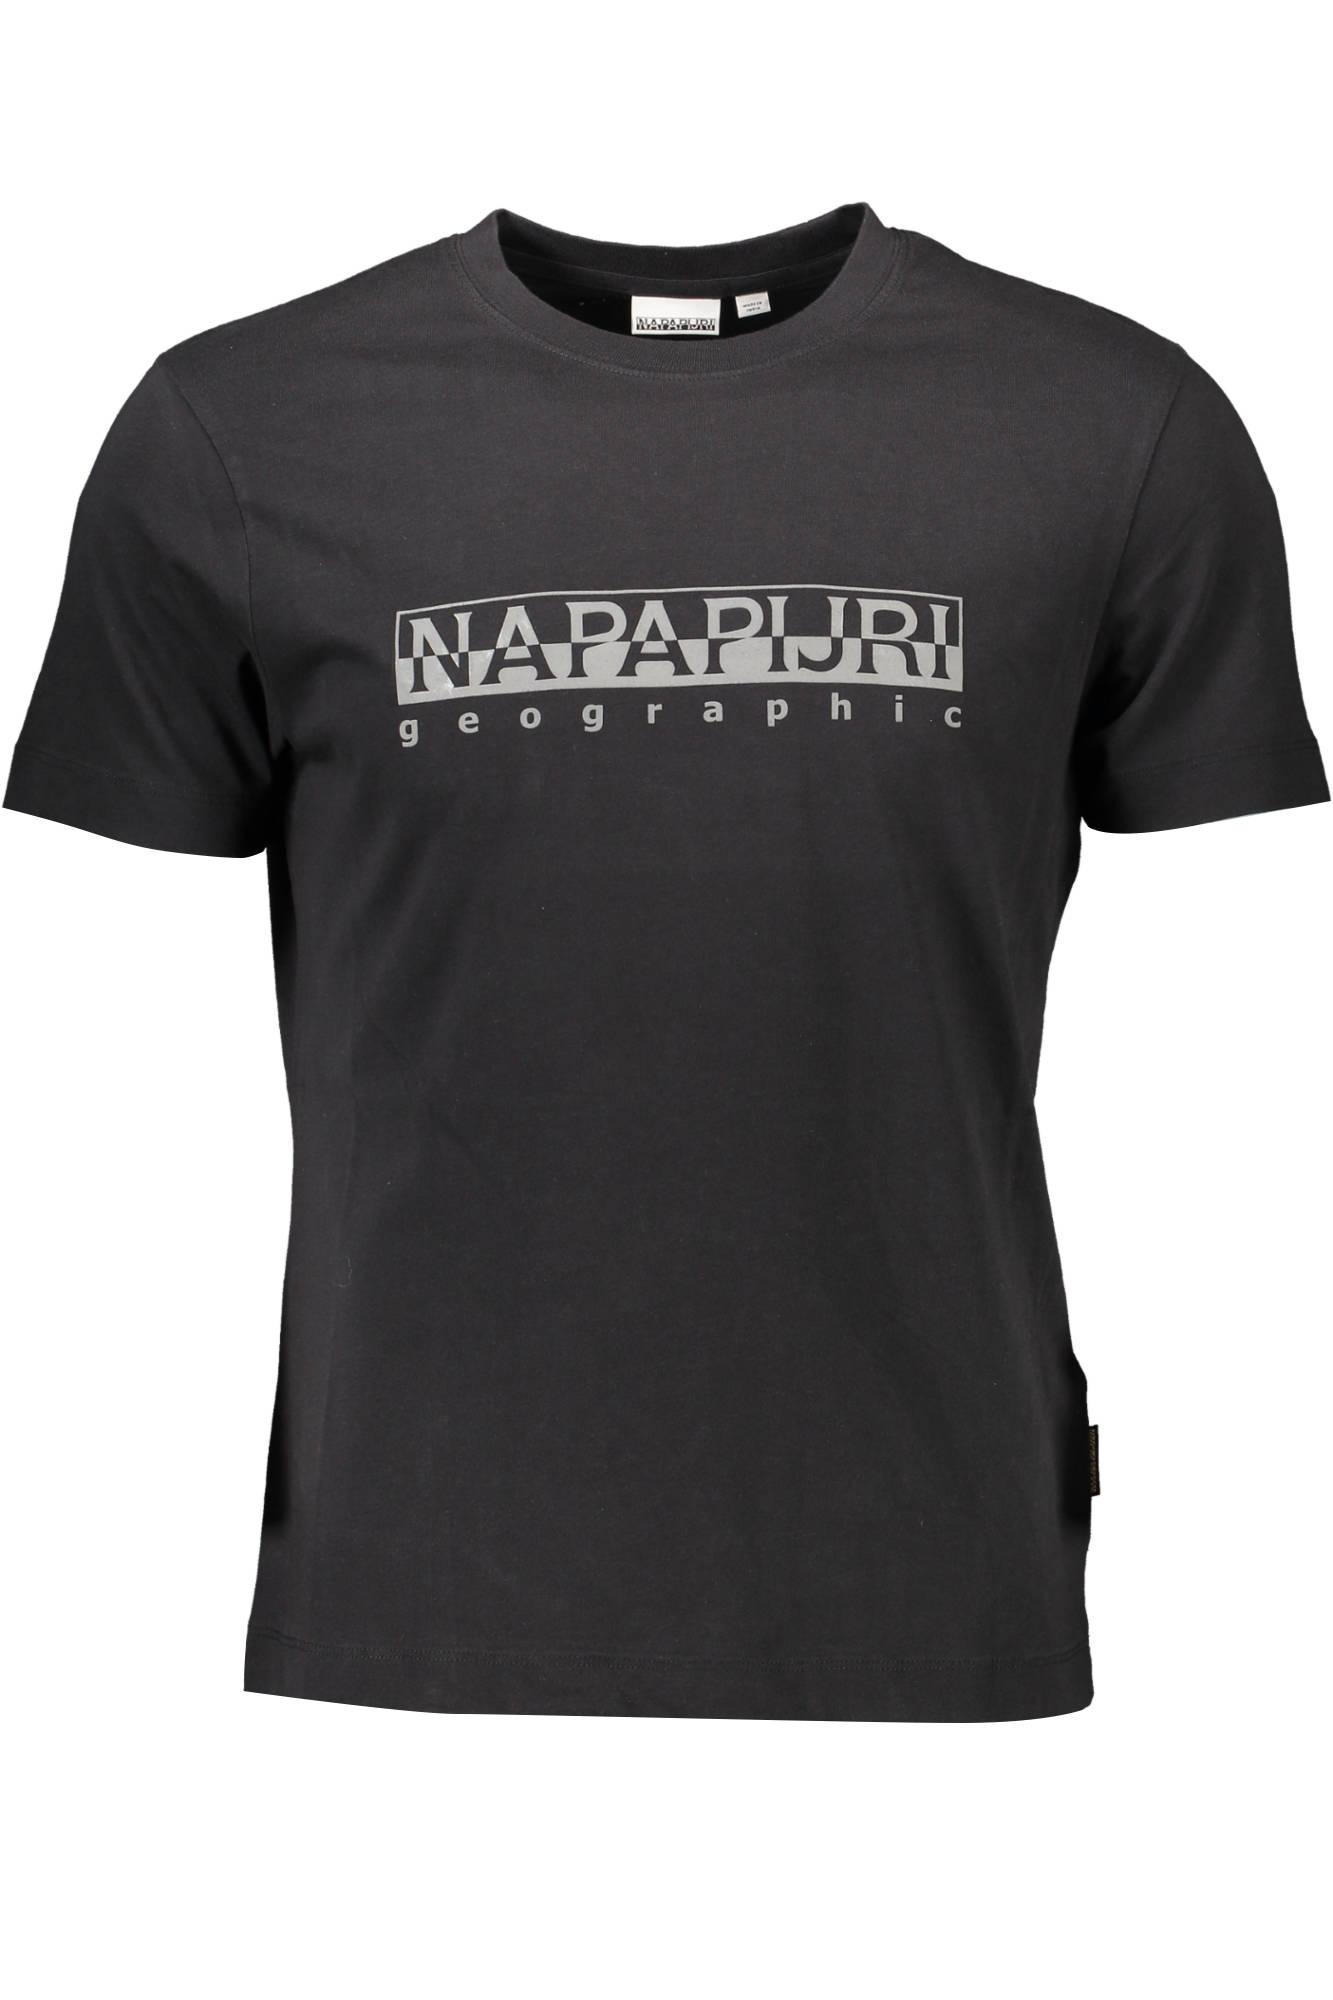 NAPAPIJRI tričko s krátkým rukávem NERO